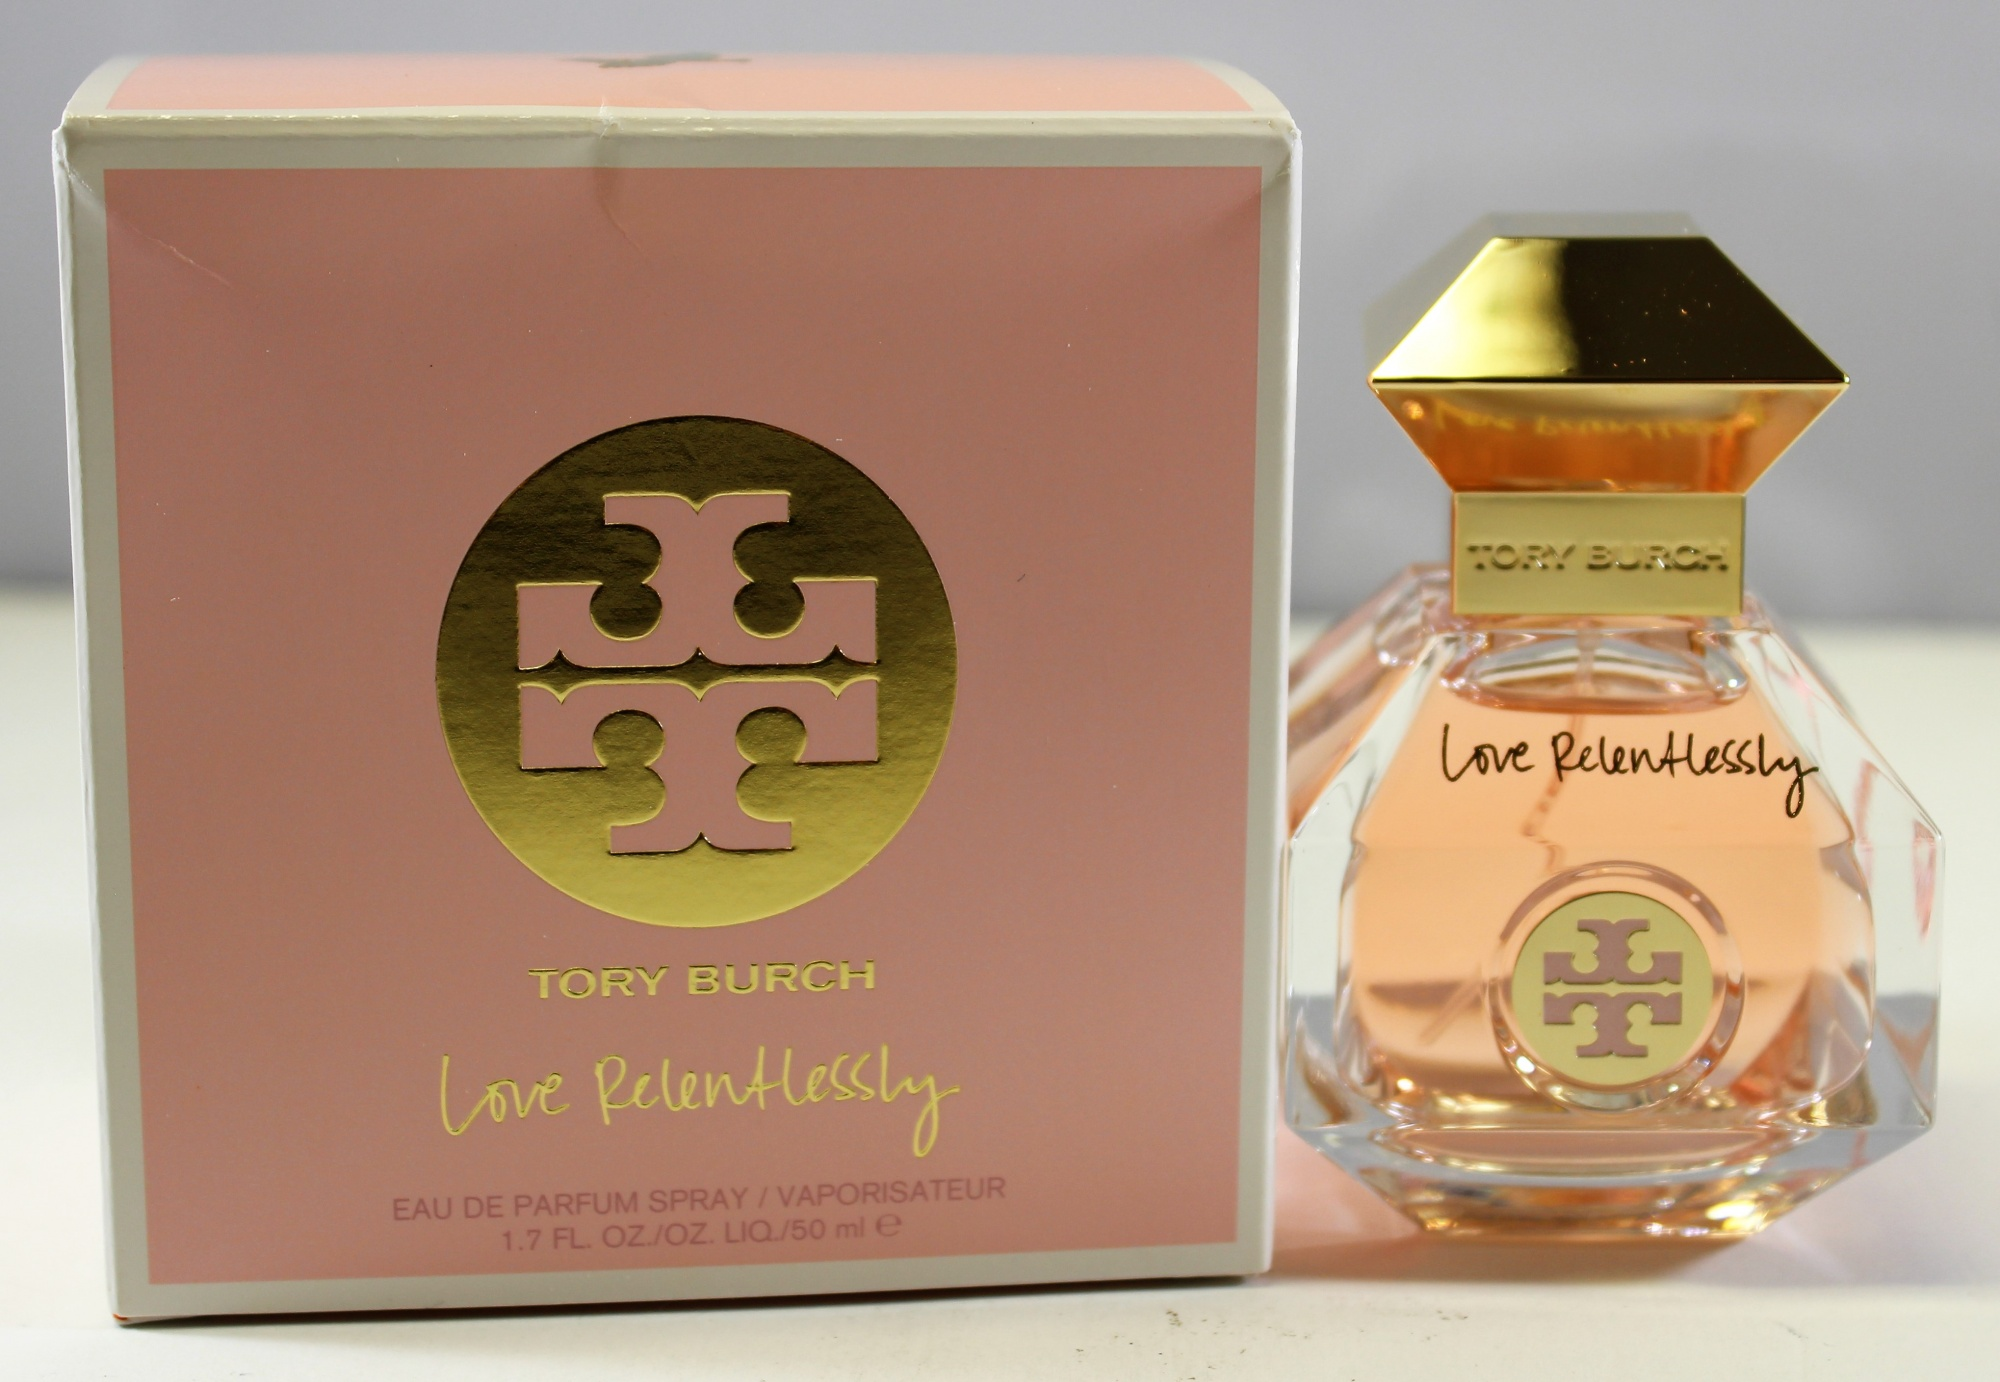 930a8f2f045 Tory Burch Love Relentlessly 50ml Eau De Parfum Spray For Women by ...